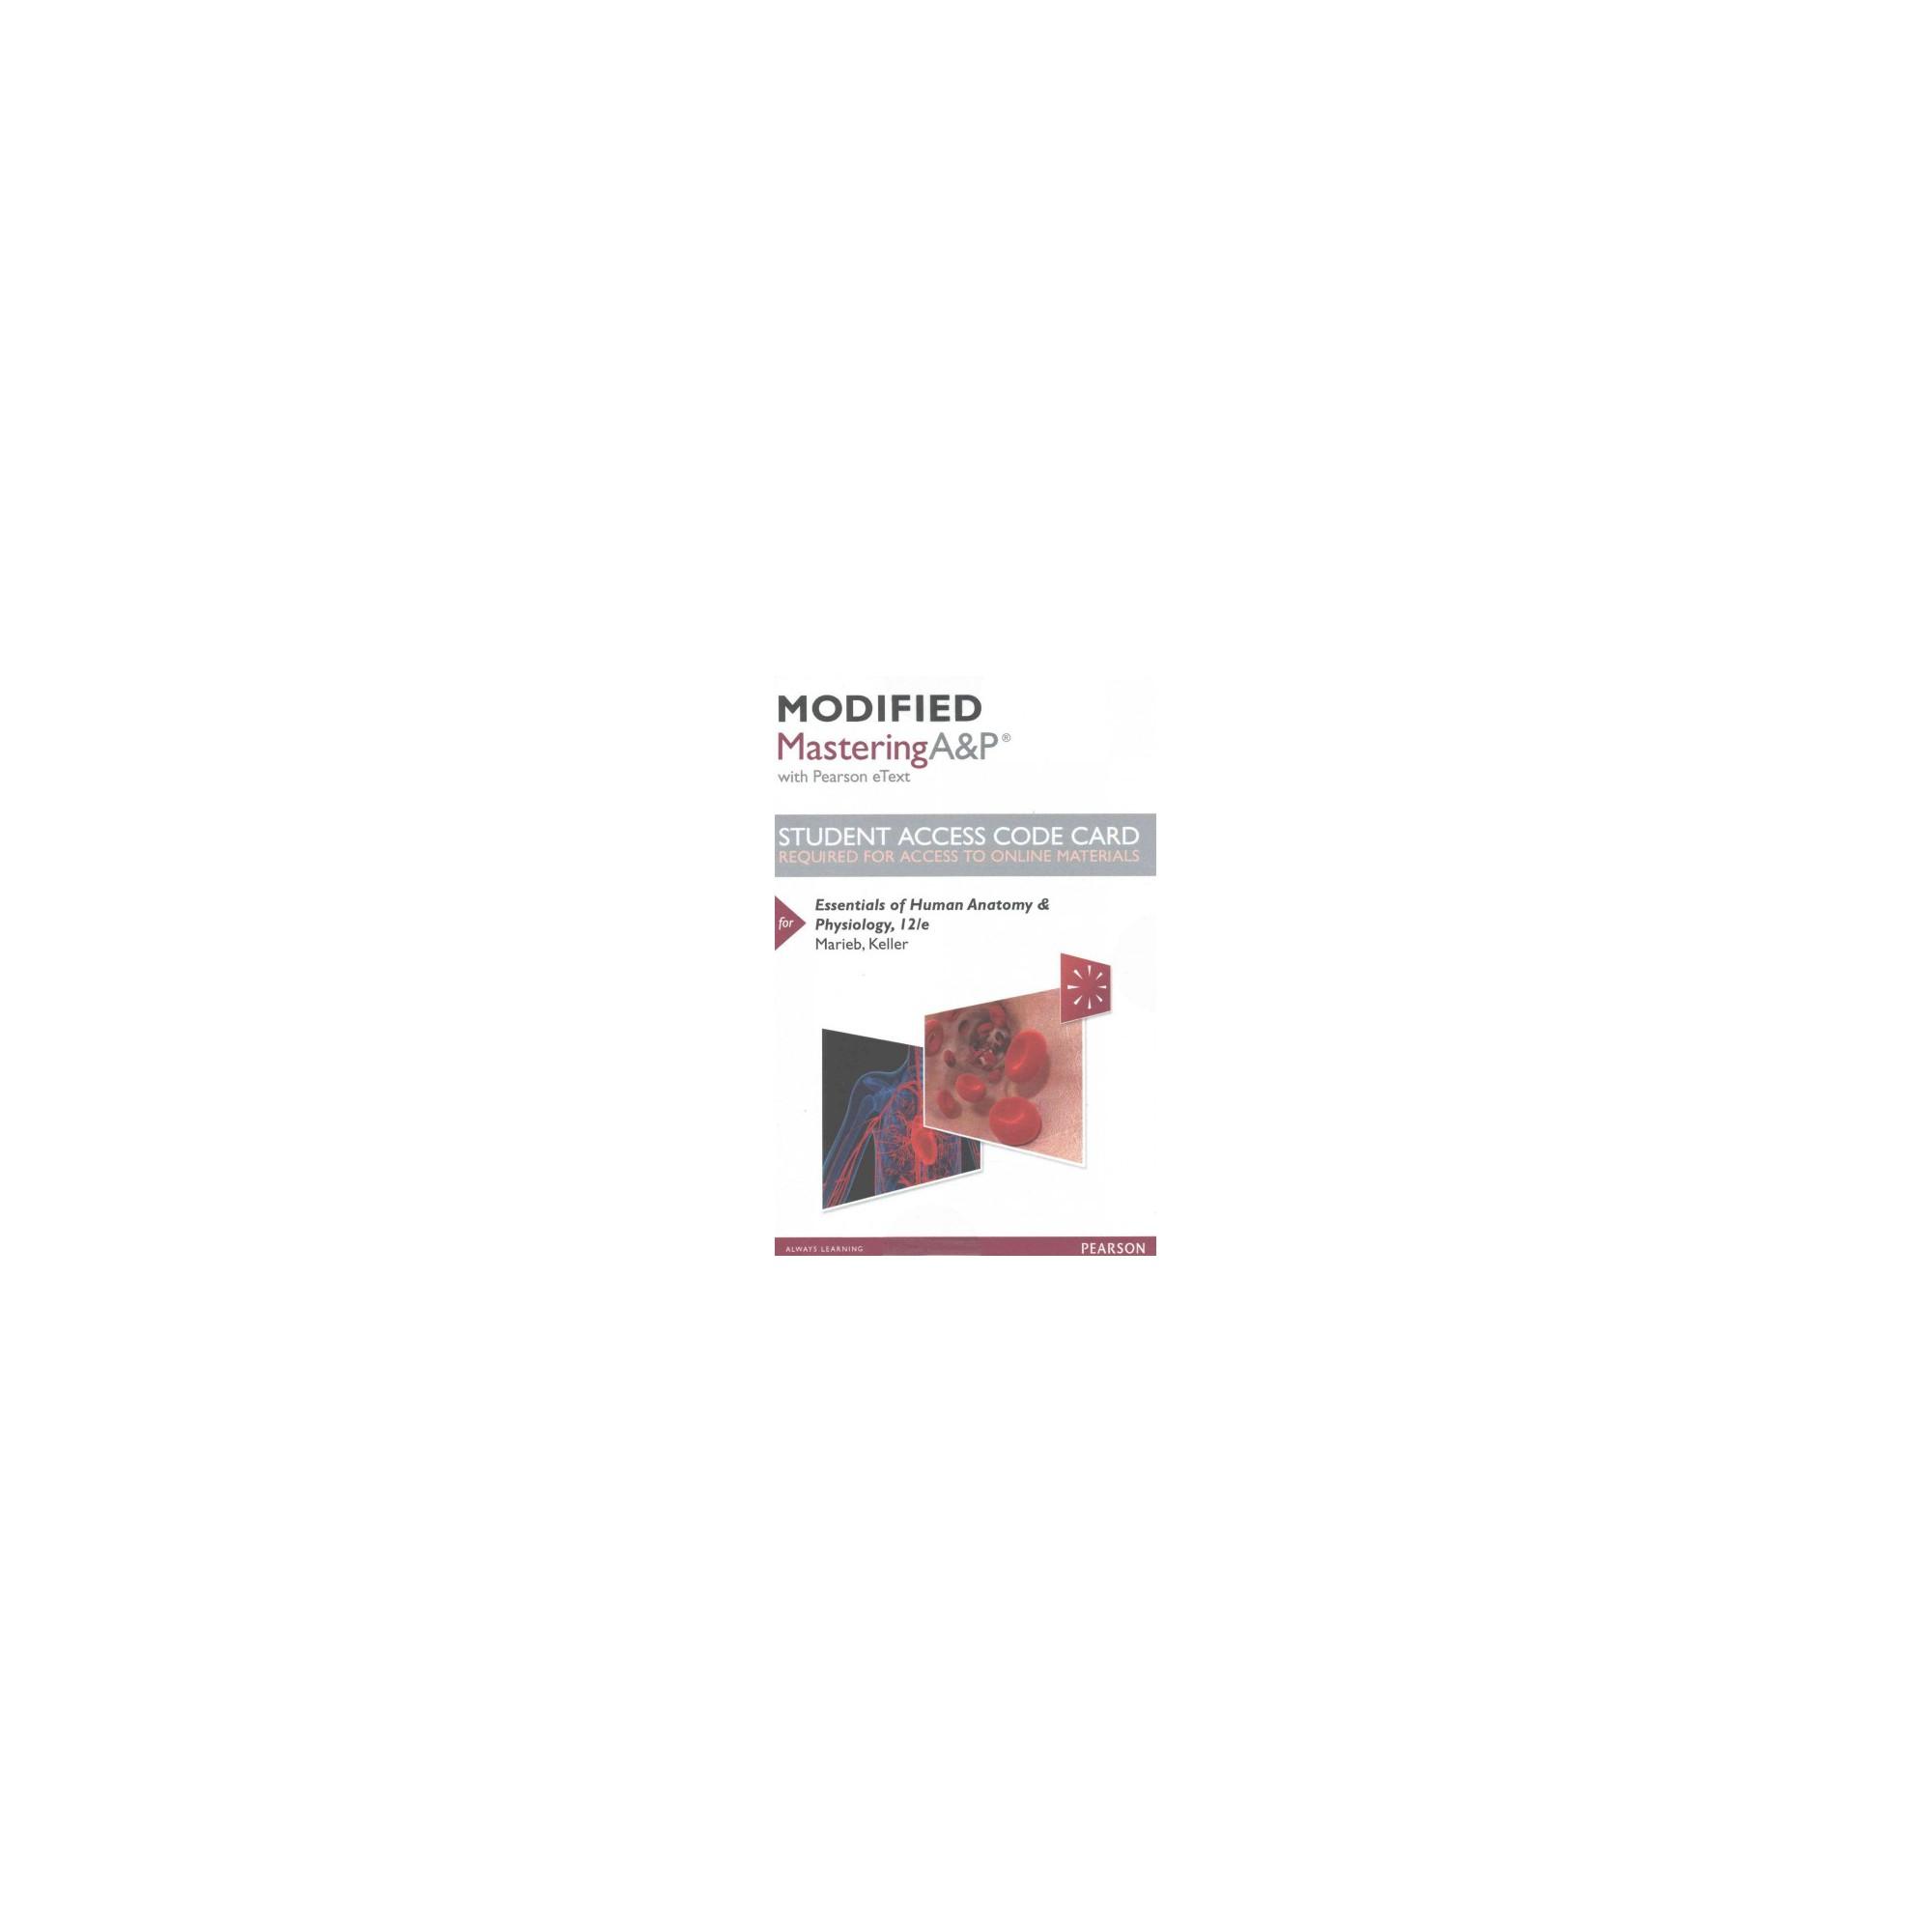 Essentials of Human Anatomy & Physiology Modified Masteringa&p ...